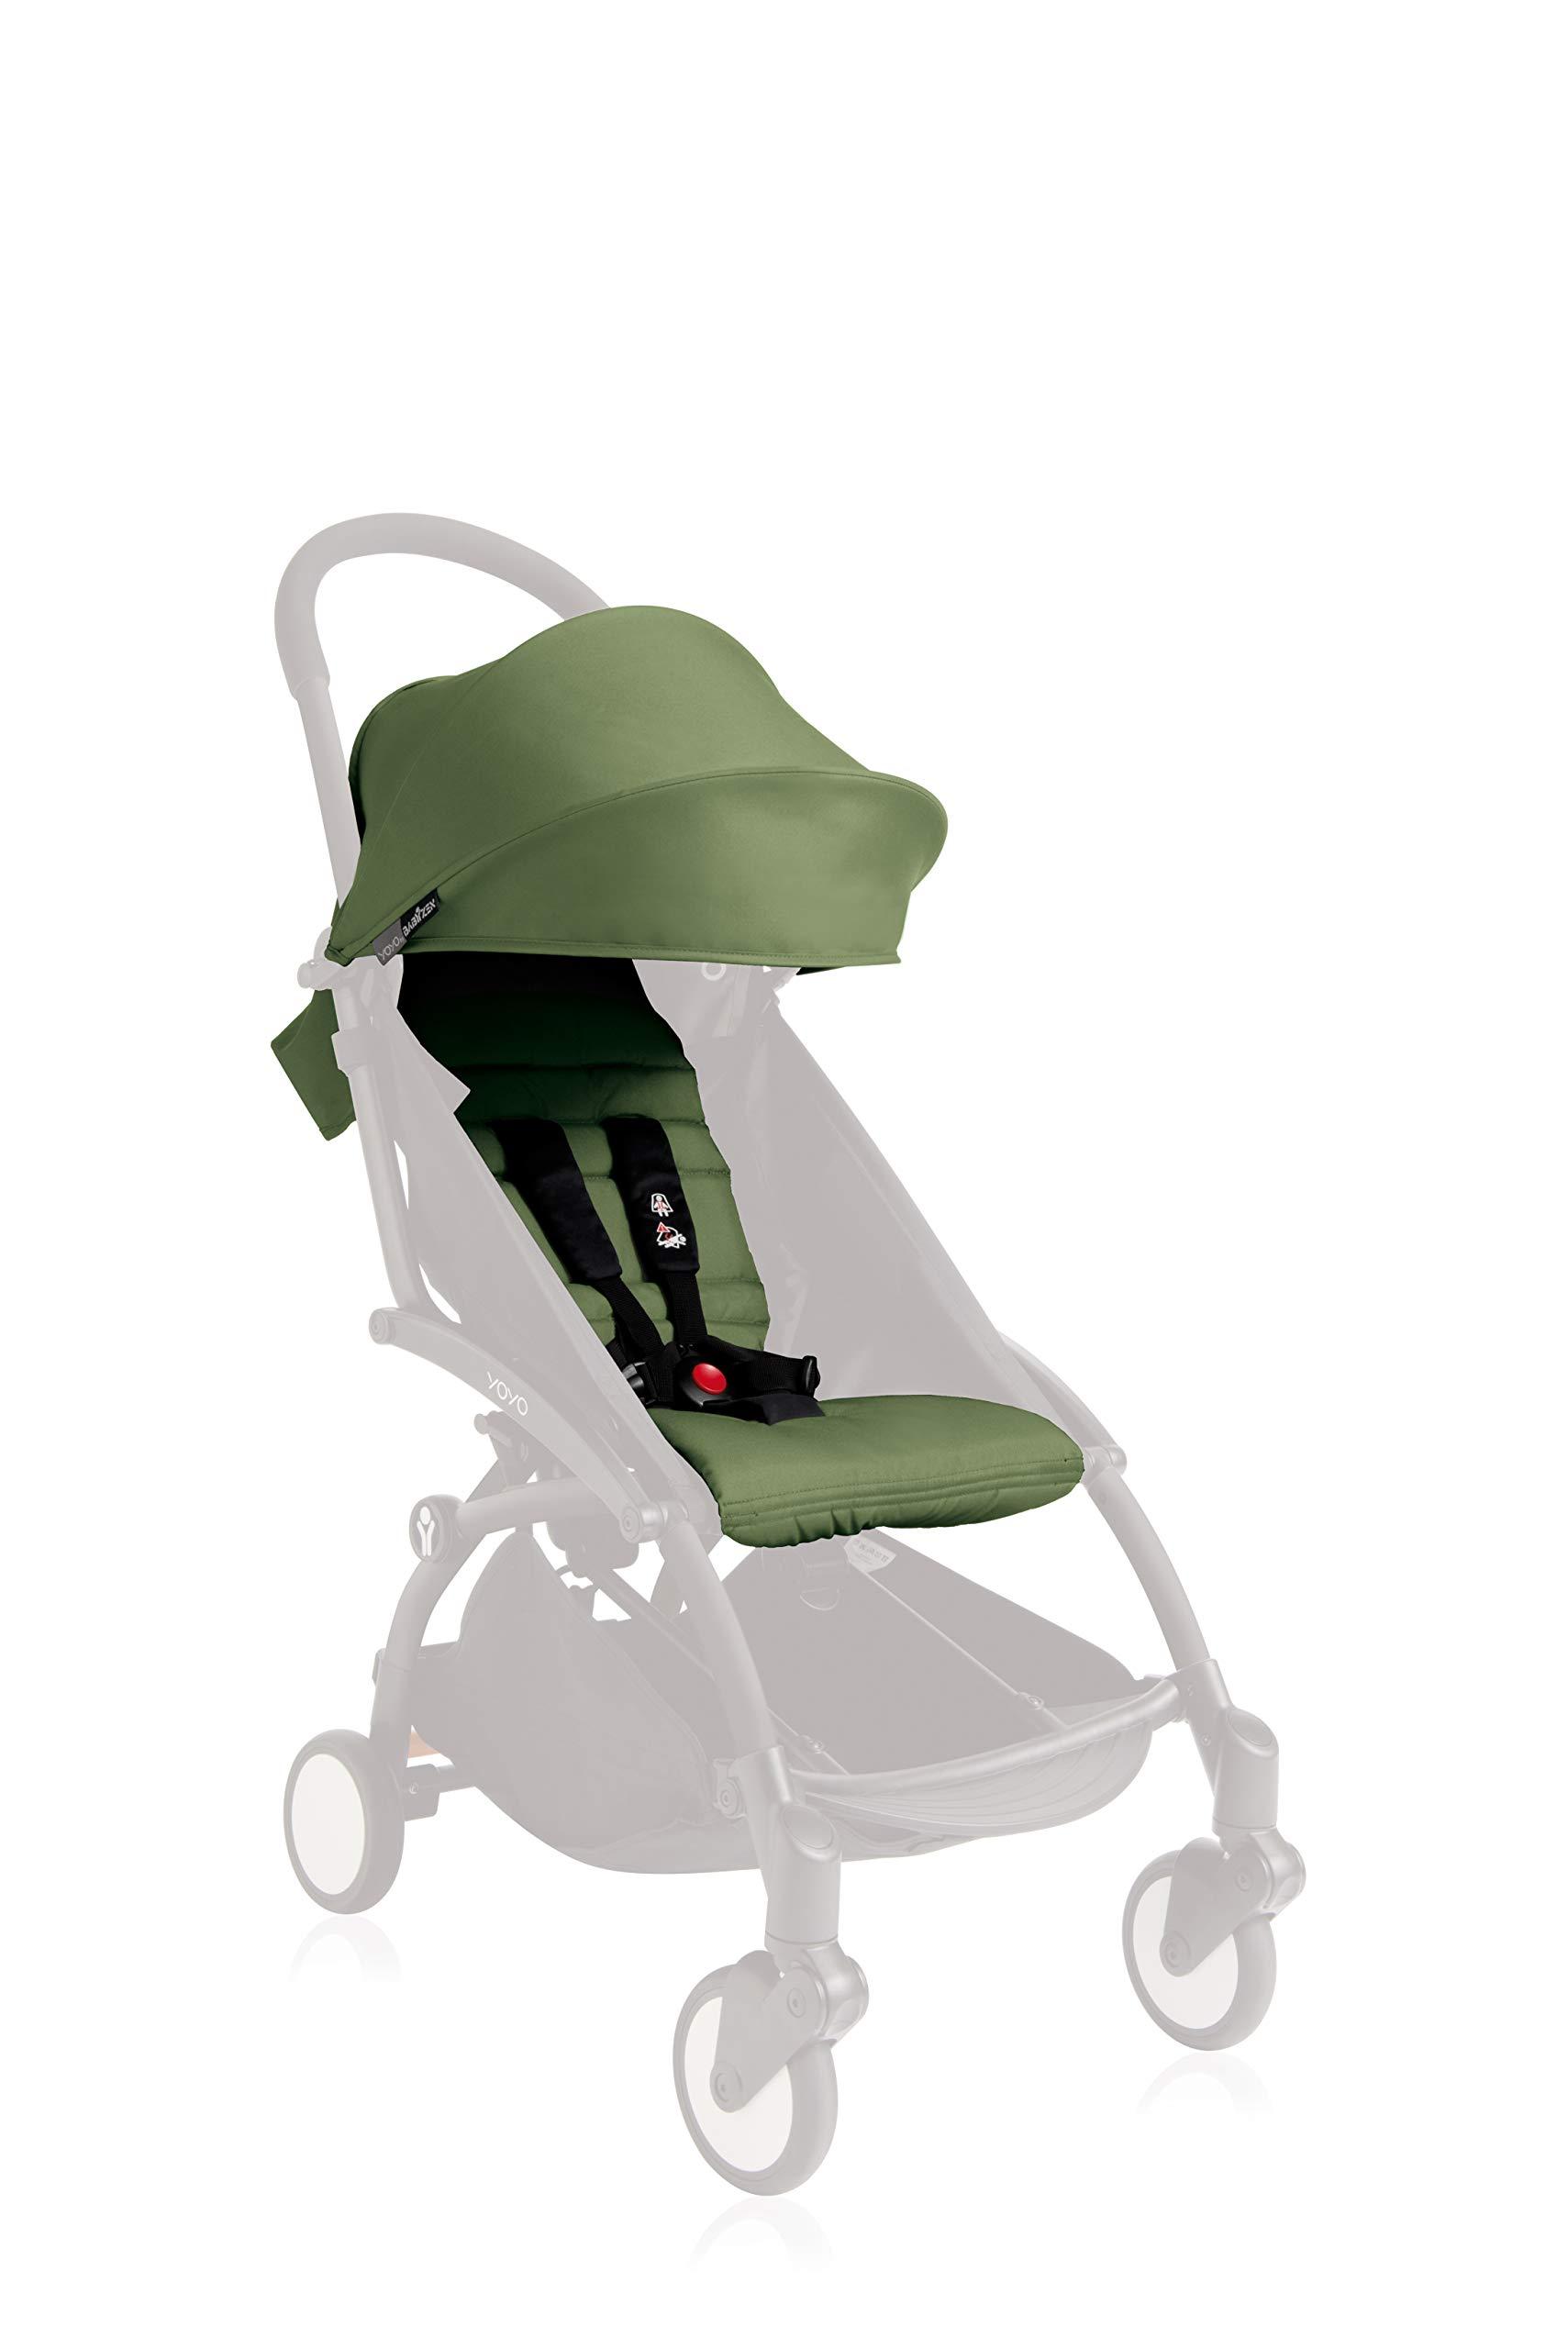 Babyzen bz10104-08Travel Systems BabyZEN Walk Babyzen shopping carts and chairs Children's Unisex Travel Systems Easy to use 1